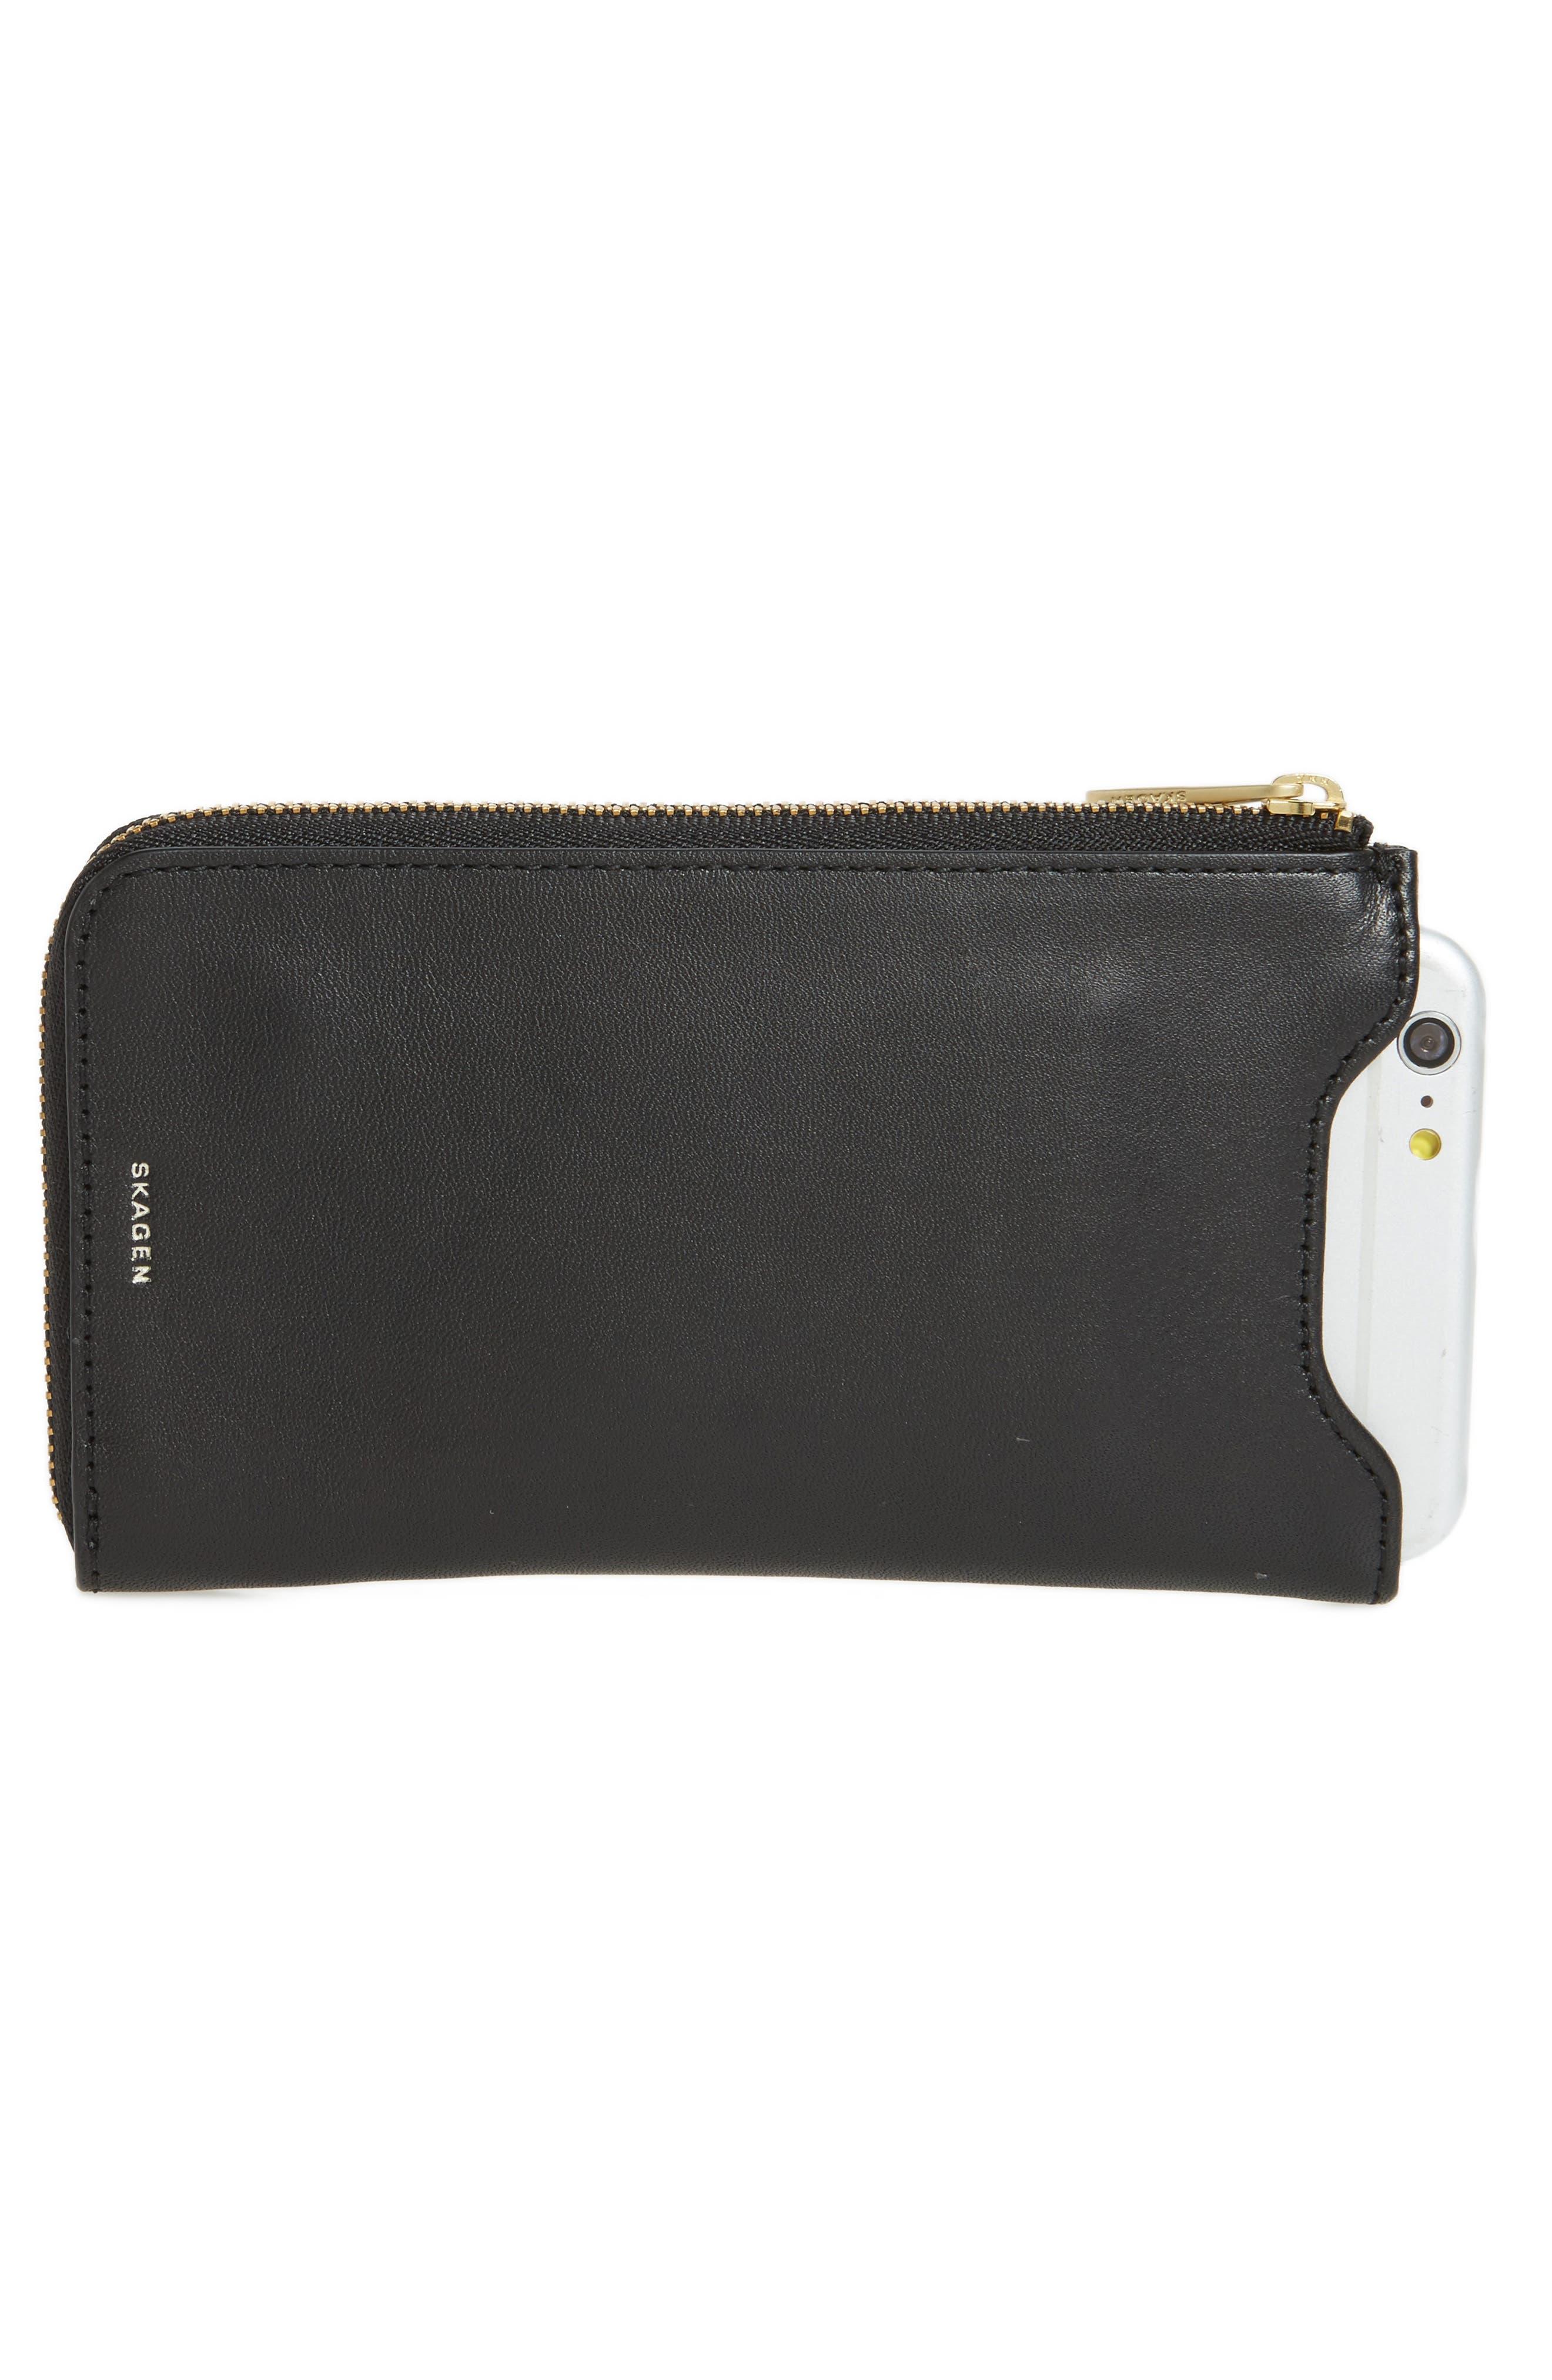 Lilli iPhone 6/6s/7 Leather Sleeve,                             Alternate thumbnail 2, color,                             Black